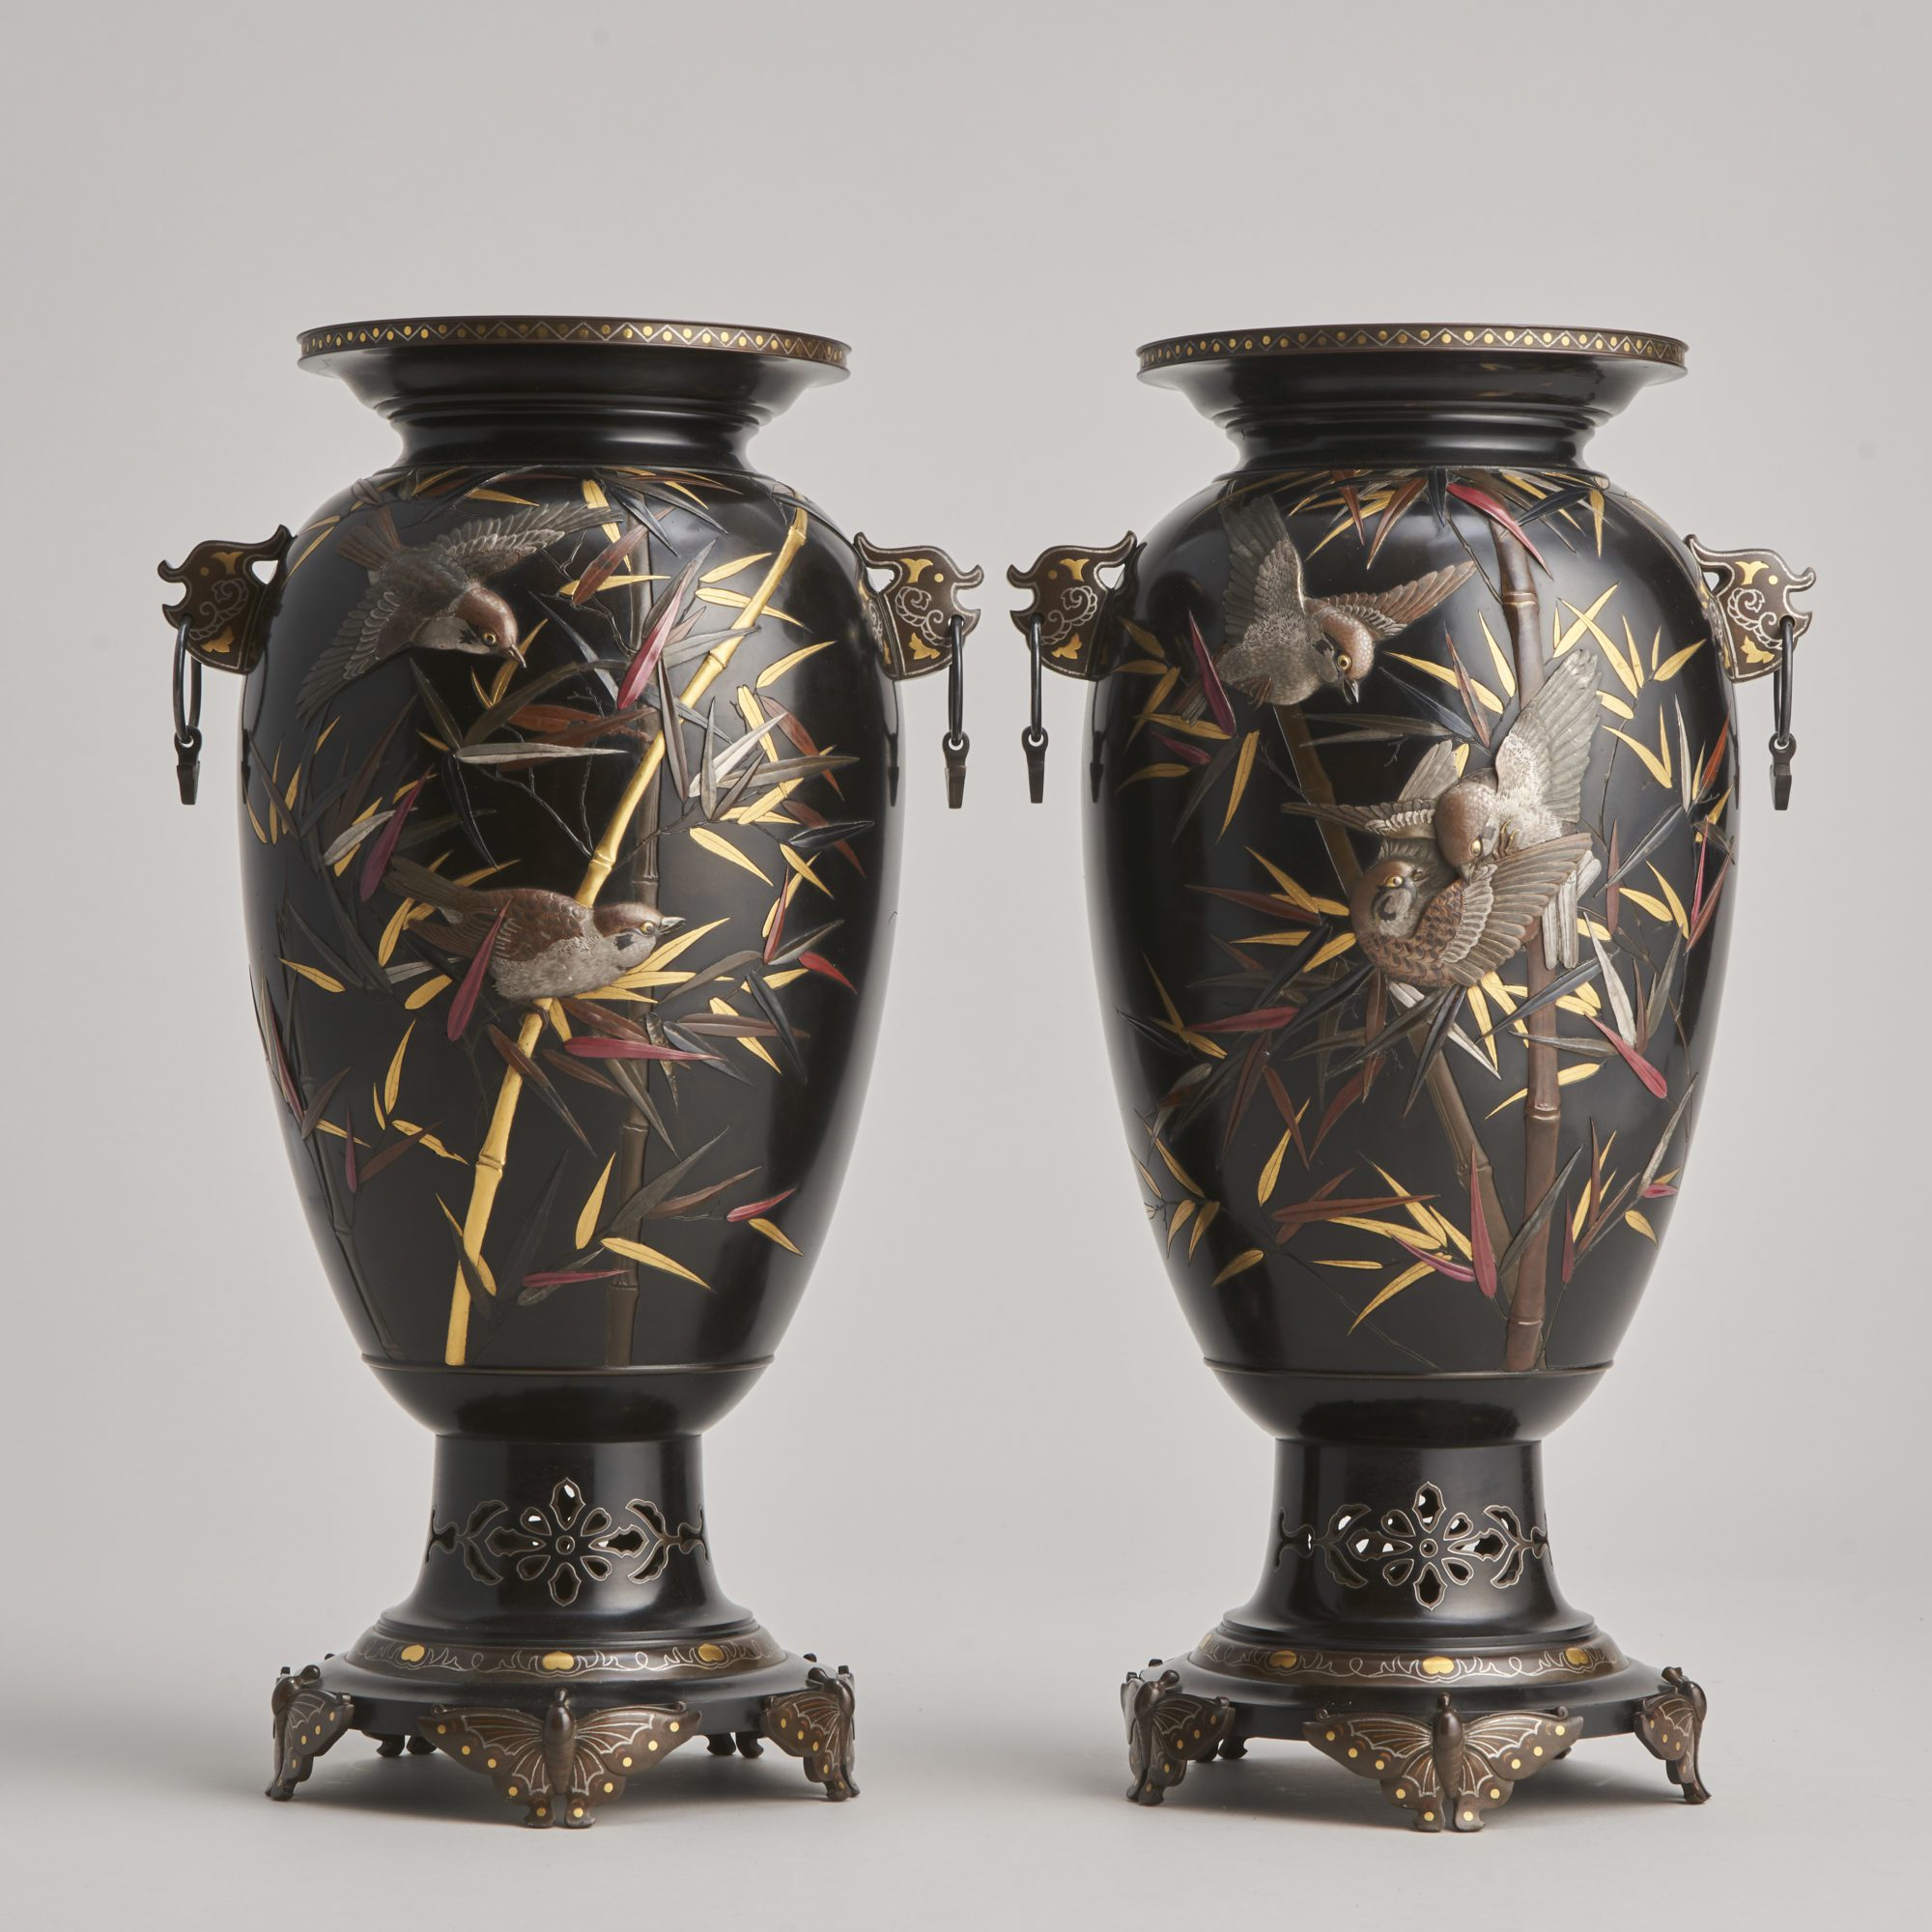 Suzuki Chokichi   An exceptional pair of antique Japanese Bronze and multi-metal vases made under the supervision of Suzuki Chokichi